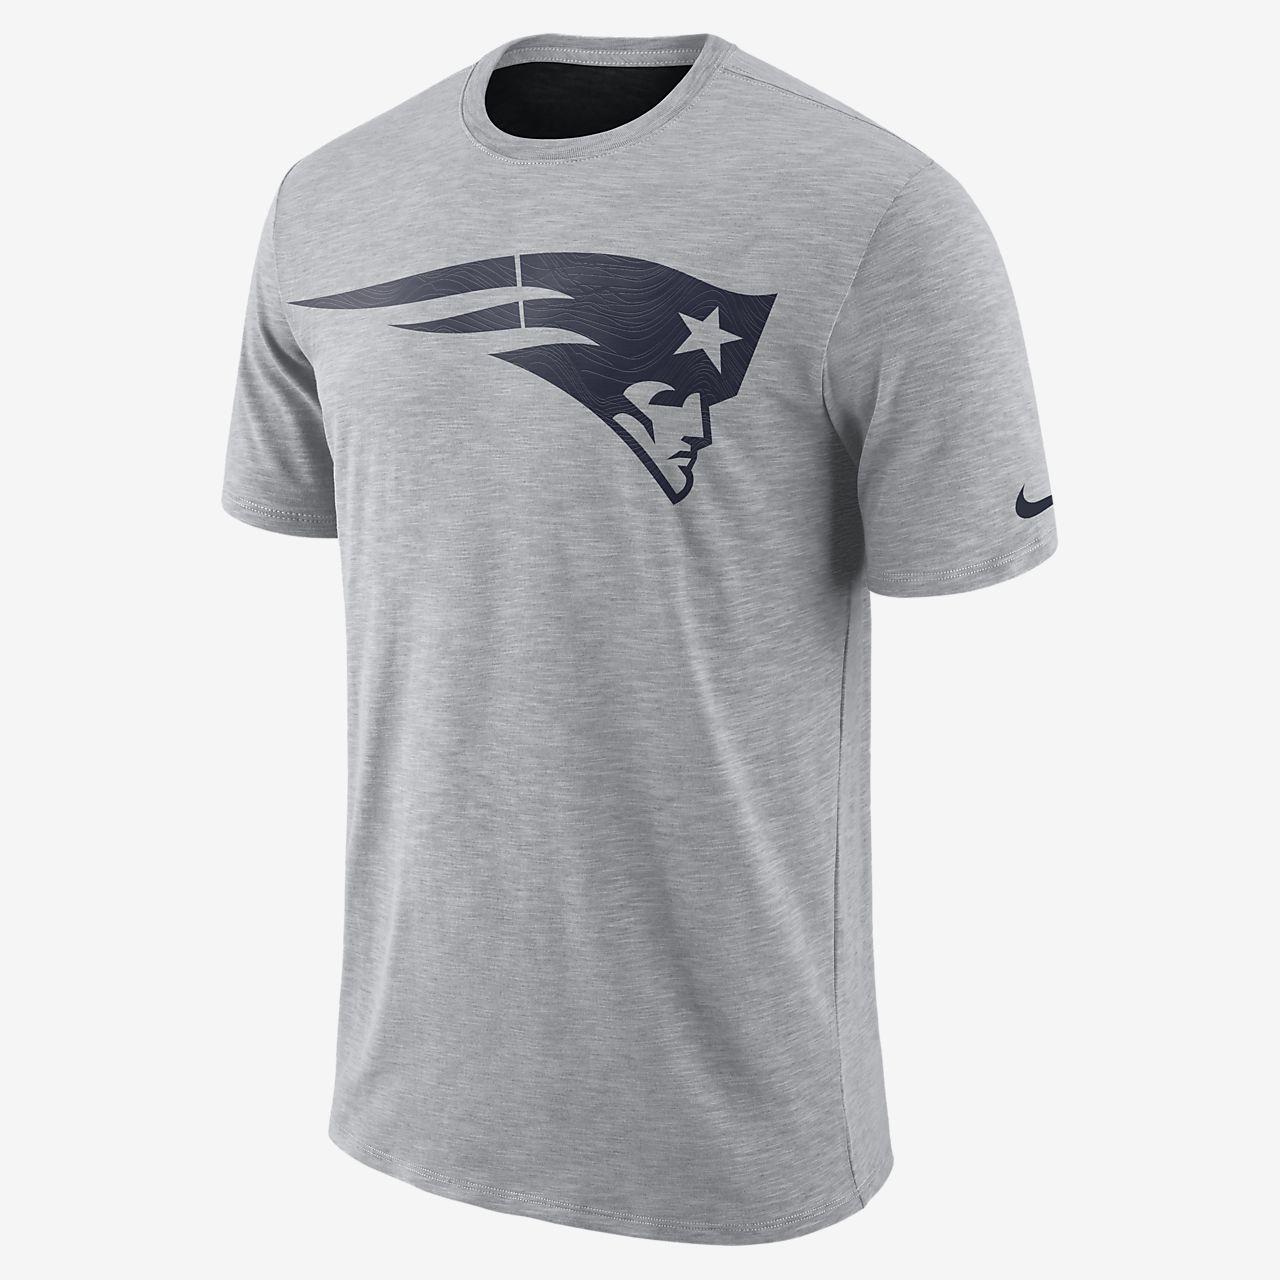 Nike Dri-FIT Legend On-Field (NFL Patriots) T-shirt voor heren